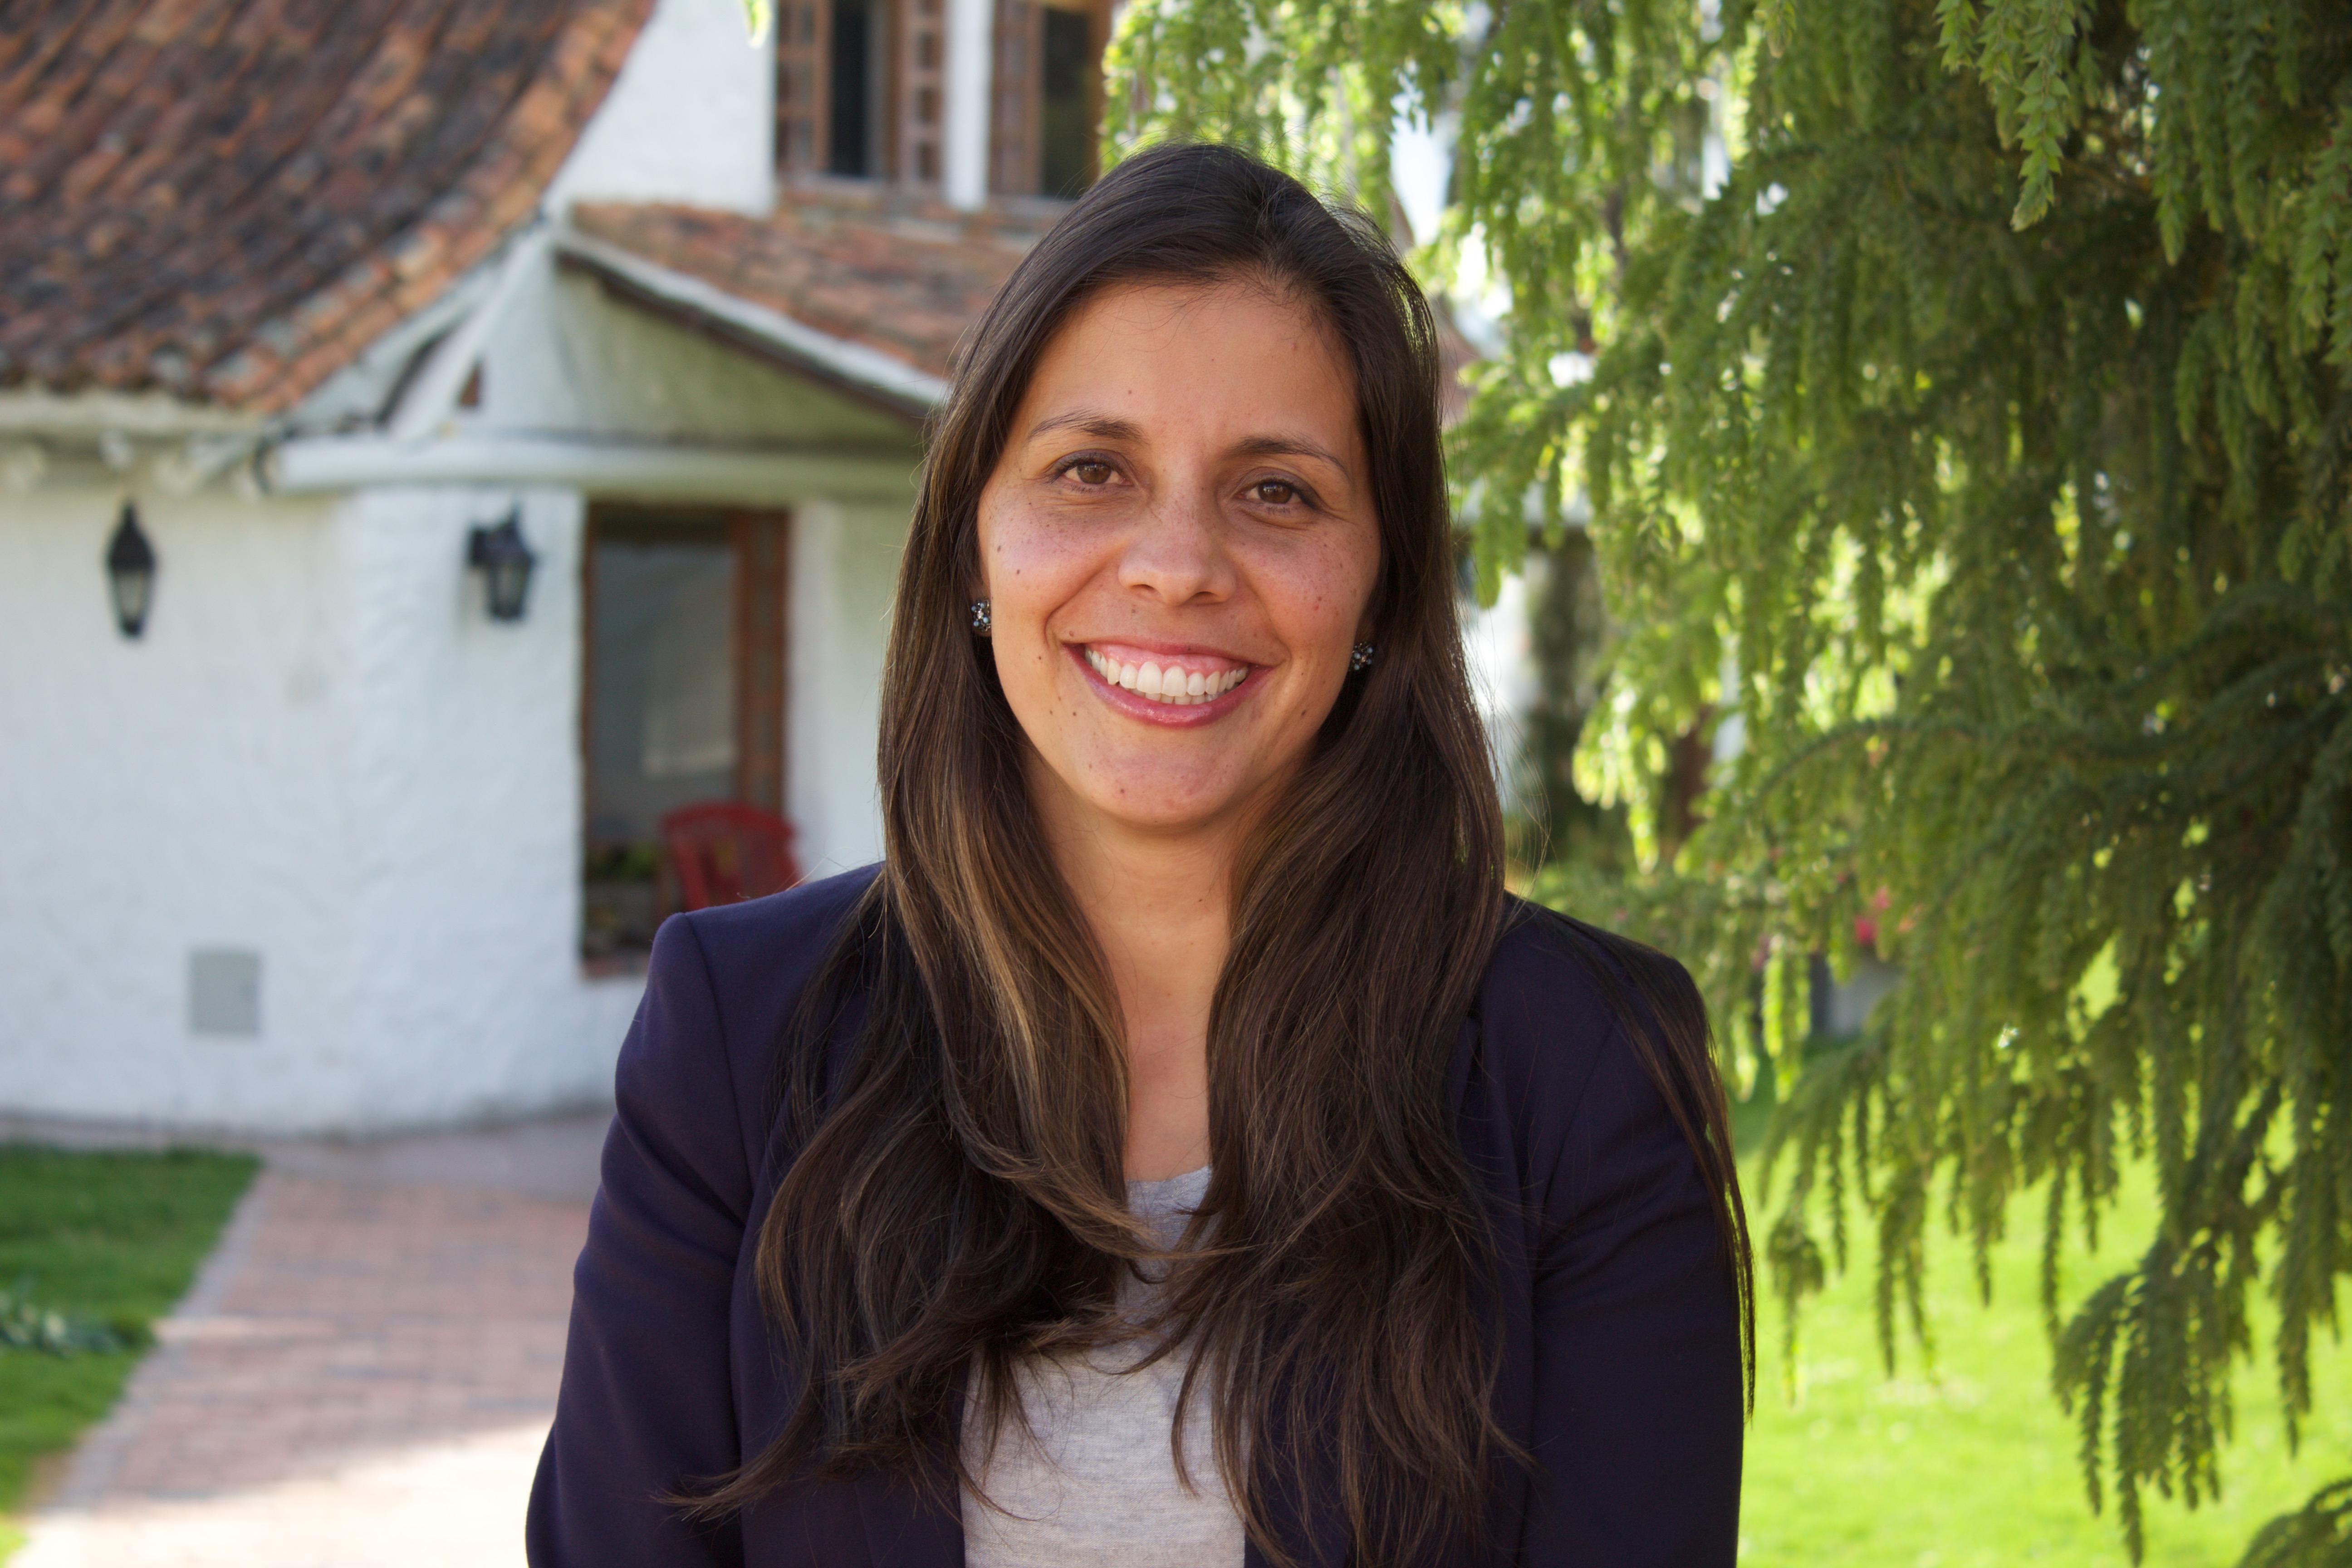 Natalia María Pineda Betancourt